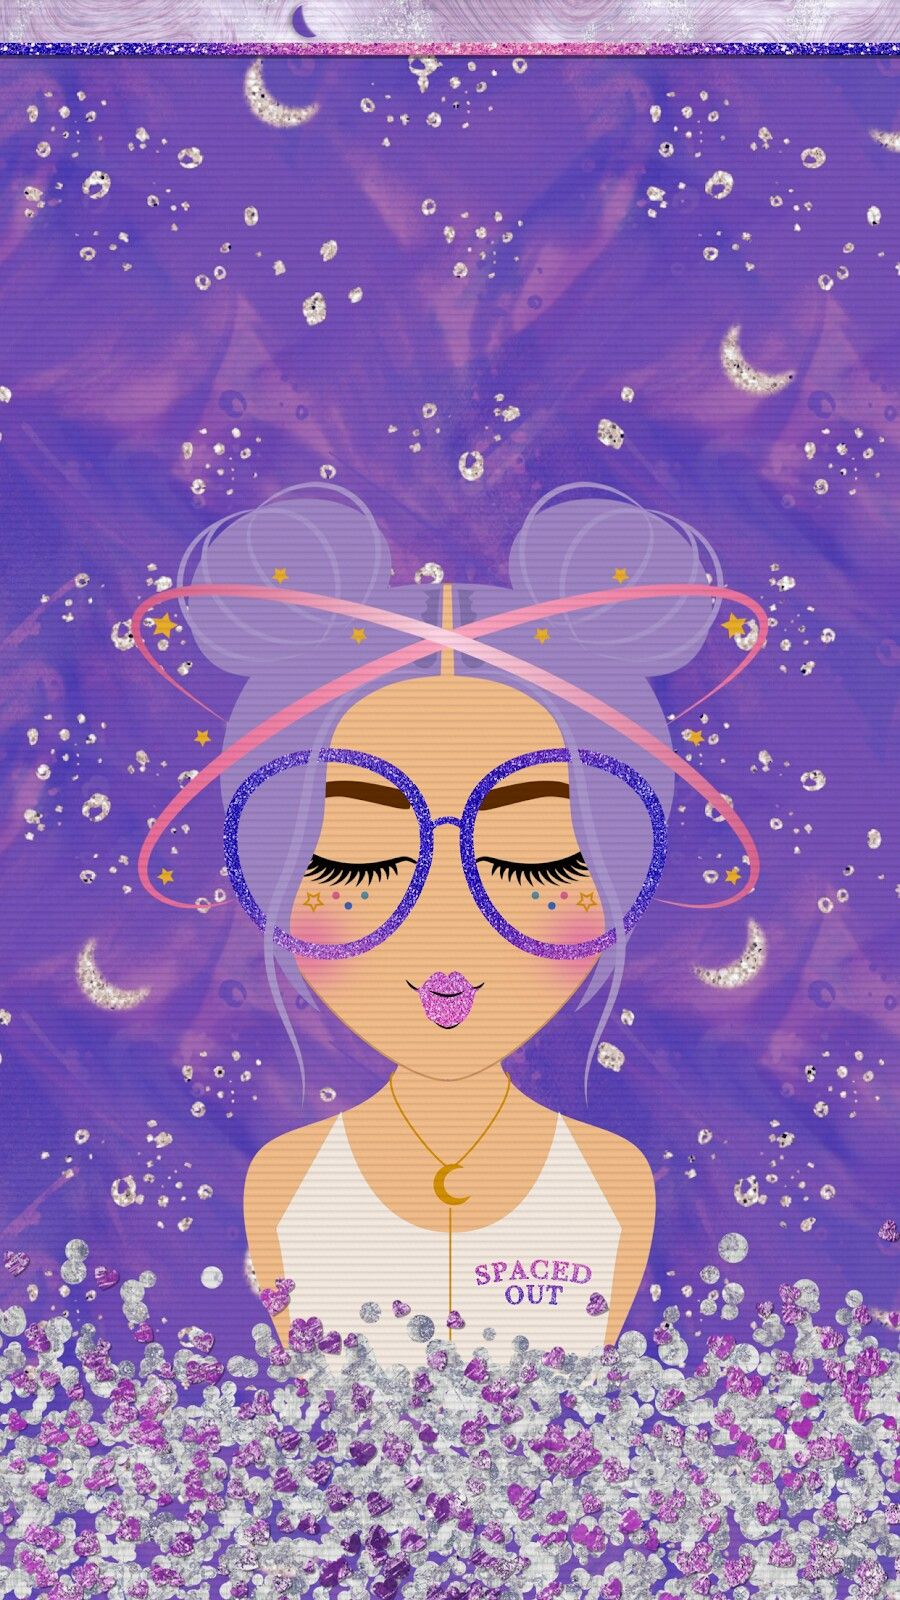 Tee S Iscreen Creations Iphone Wallpaper Glitter Cute Wallpapers Cute Girl Wallpaper